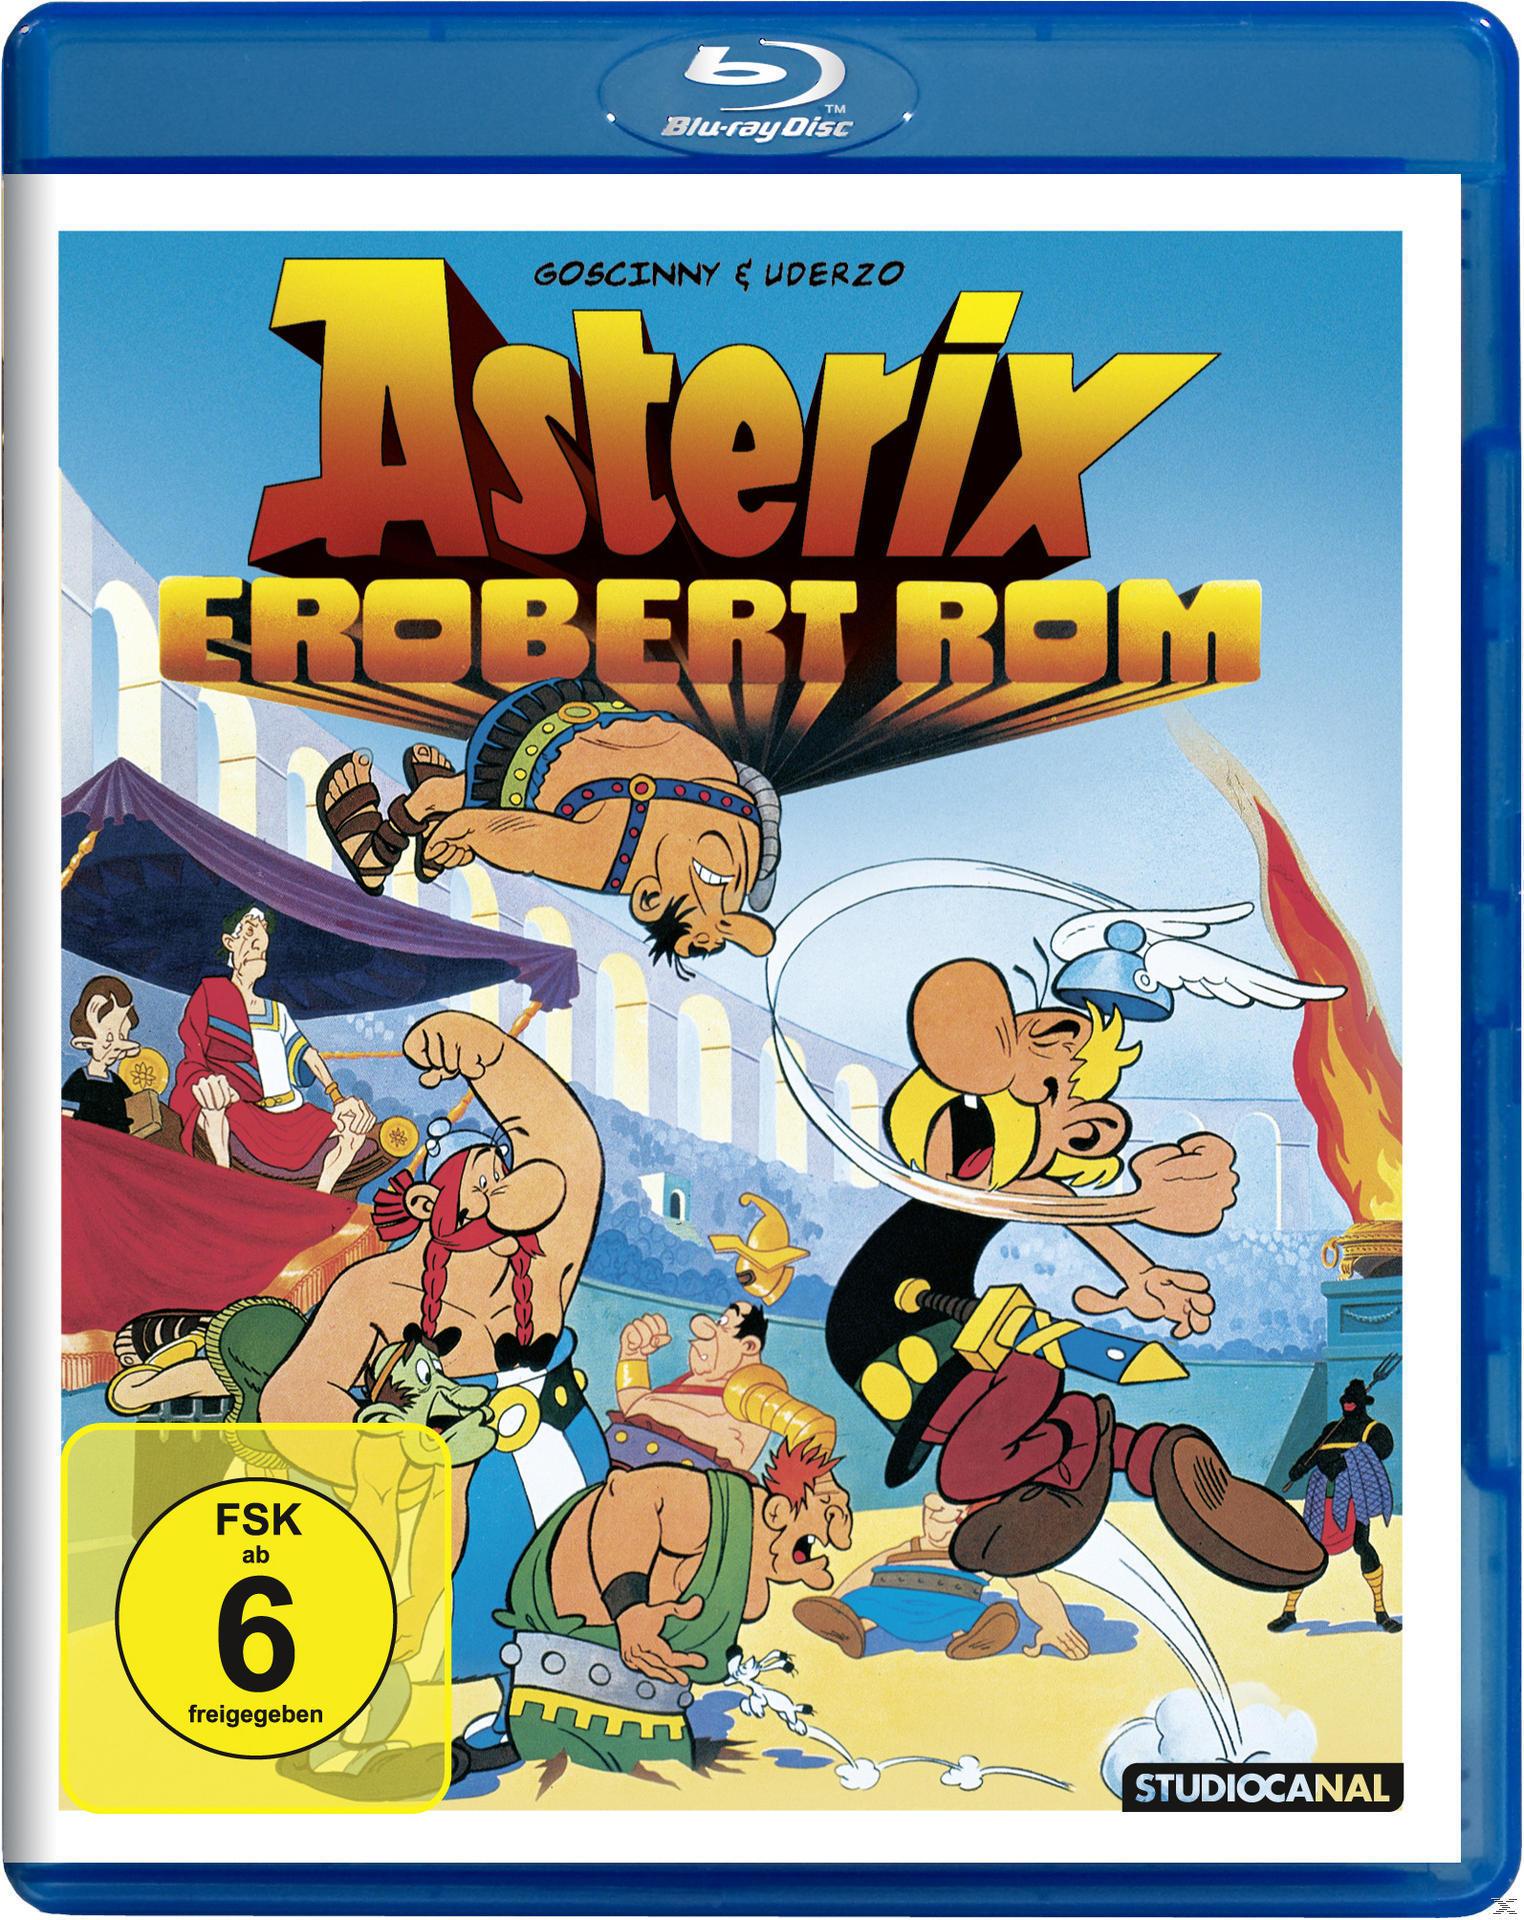 Asterix erobert Rom (BLU-RAY) für 9,99 Euro